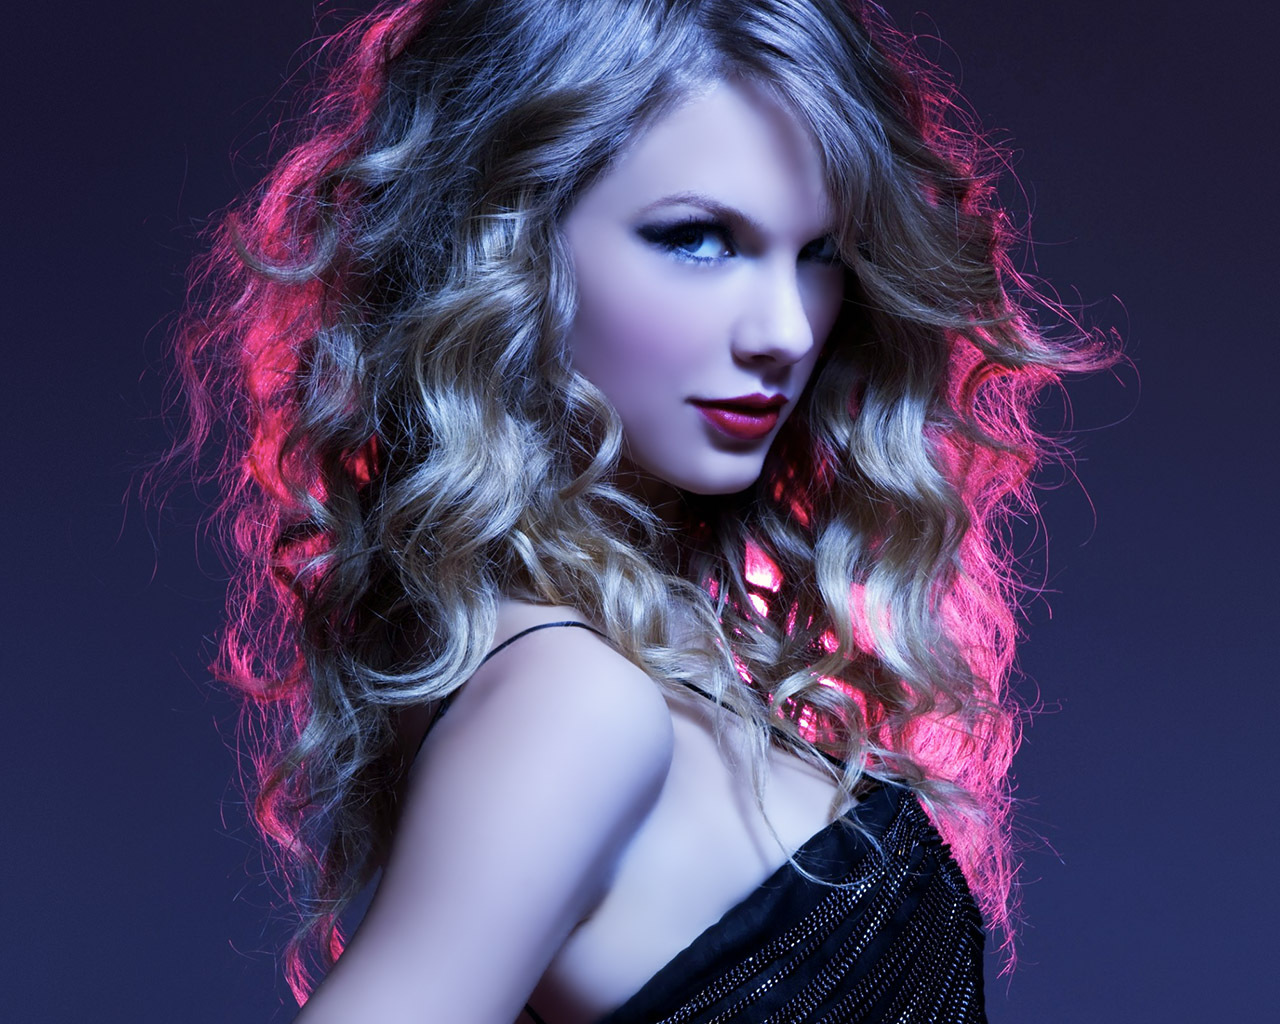 http://3.bp.blogspot.com/_KZSI3evYX40/TUuqffUASTI/AAAAAAAAACQ/kp0EAnx5vrQ/s1600/Taylor-Swift-Wallpaper-taylor-swift-18456079-1280-1024.jpg